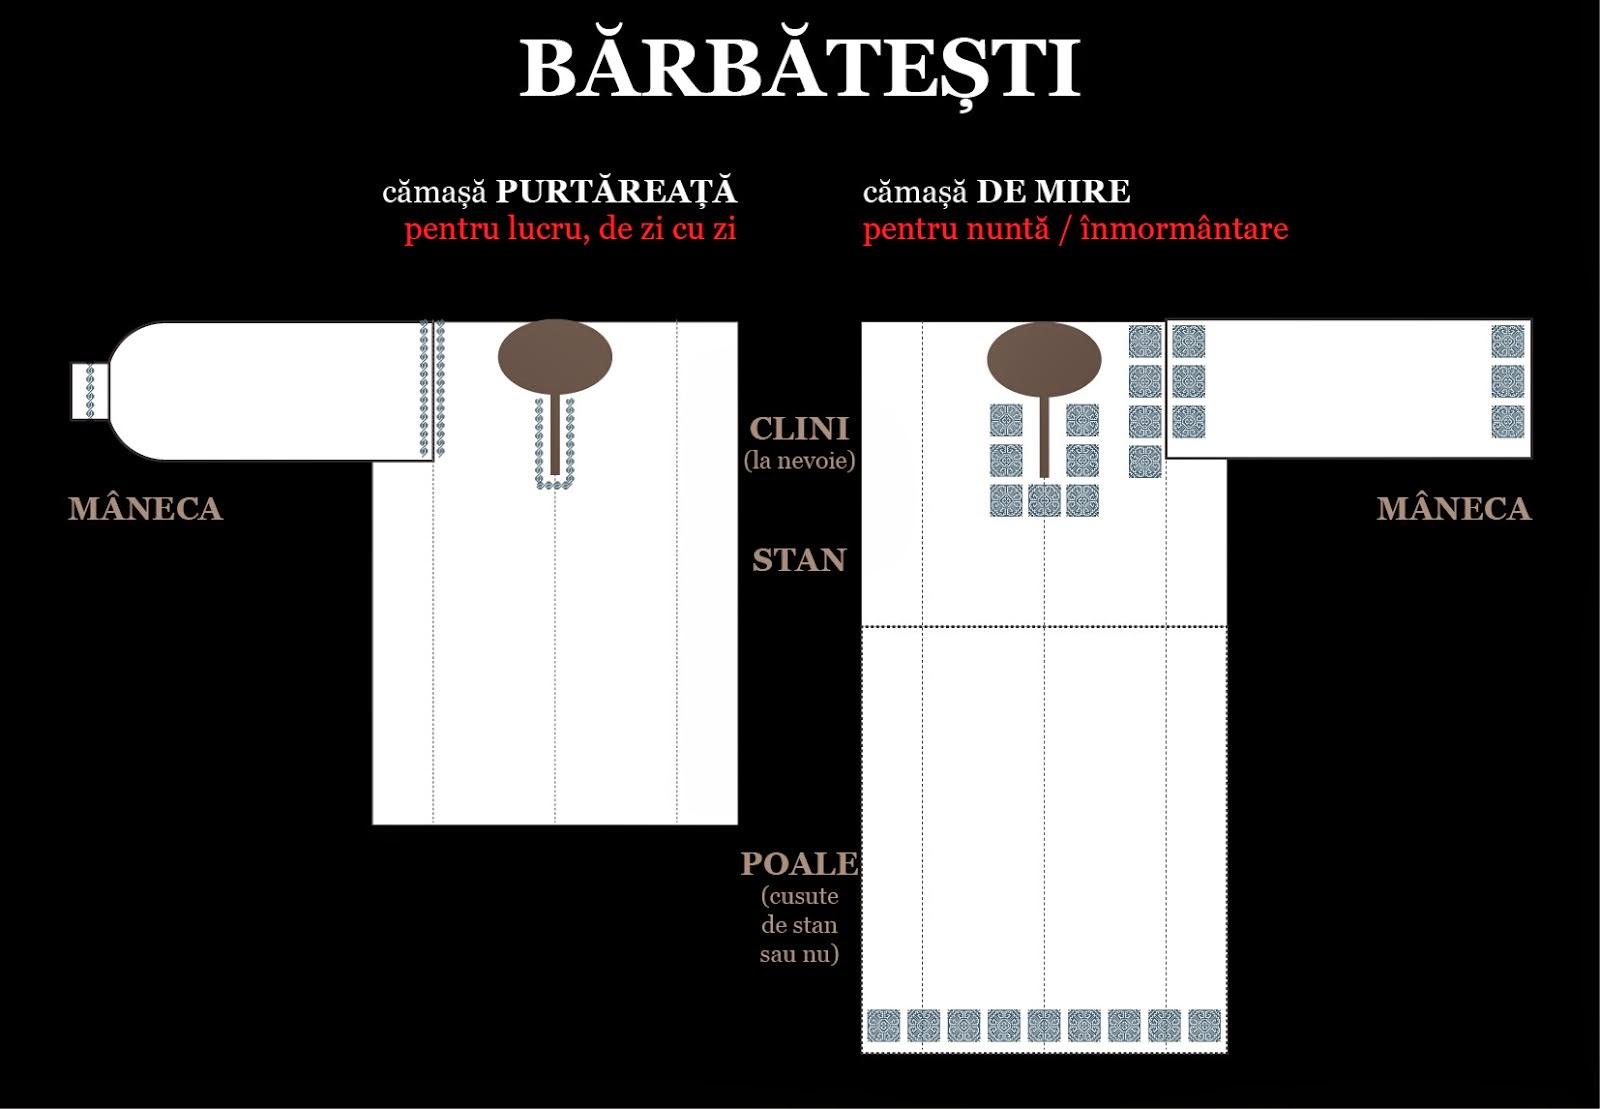 croi camasa populara barbateasca traditionala romaneasca